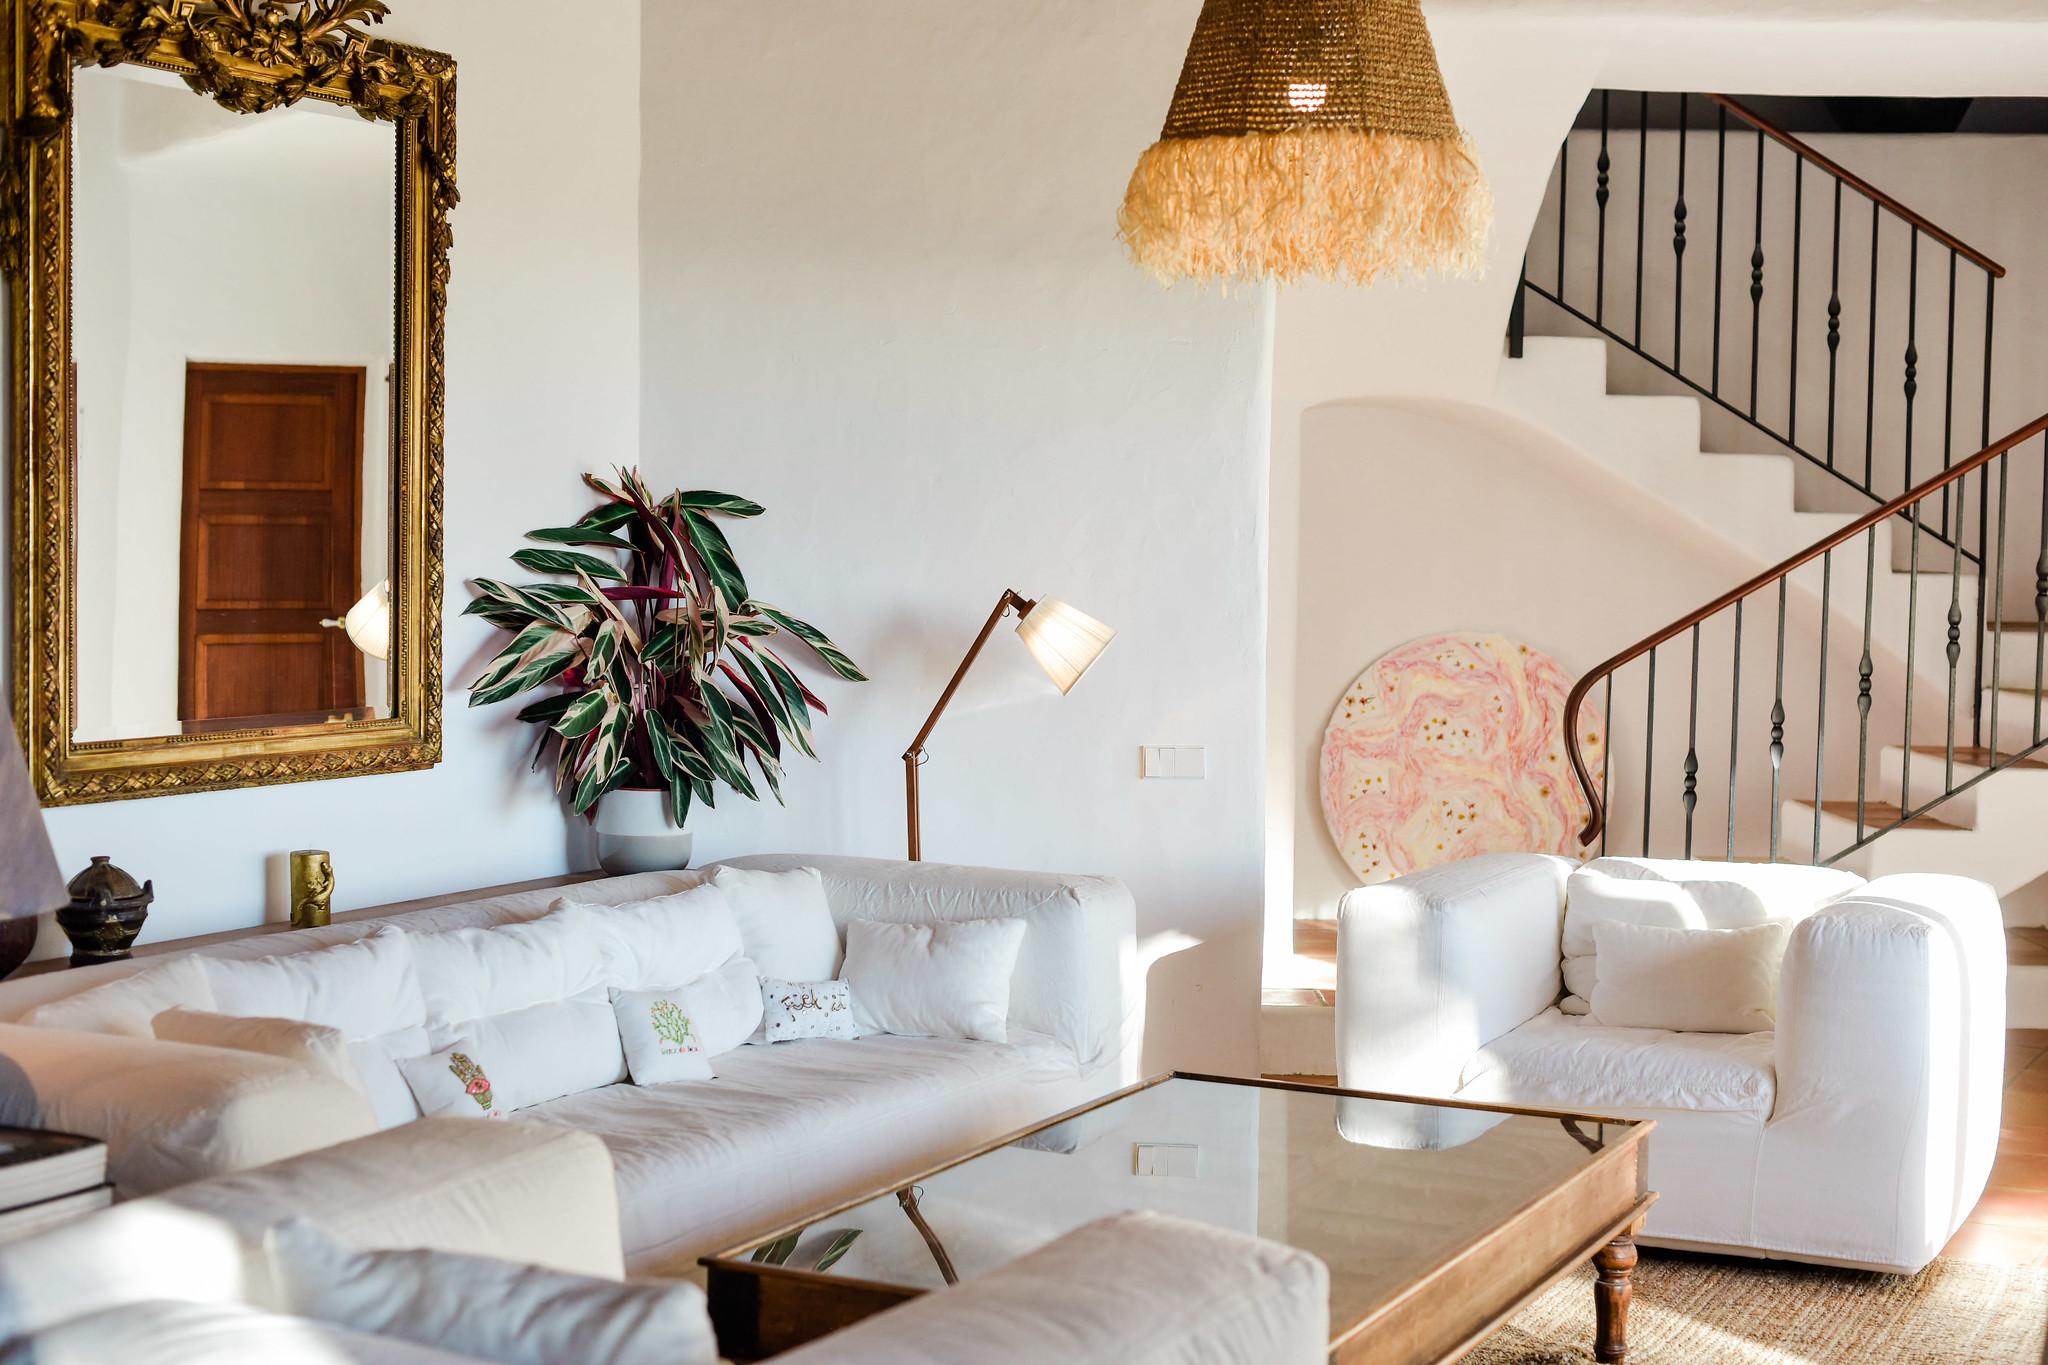 https://www.white-ibiza.com/wp-content/uploads/2020/05/white-ibiza-villas-can-lavanda-living-room.jpg